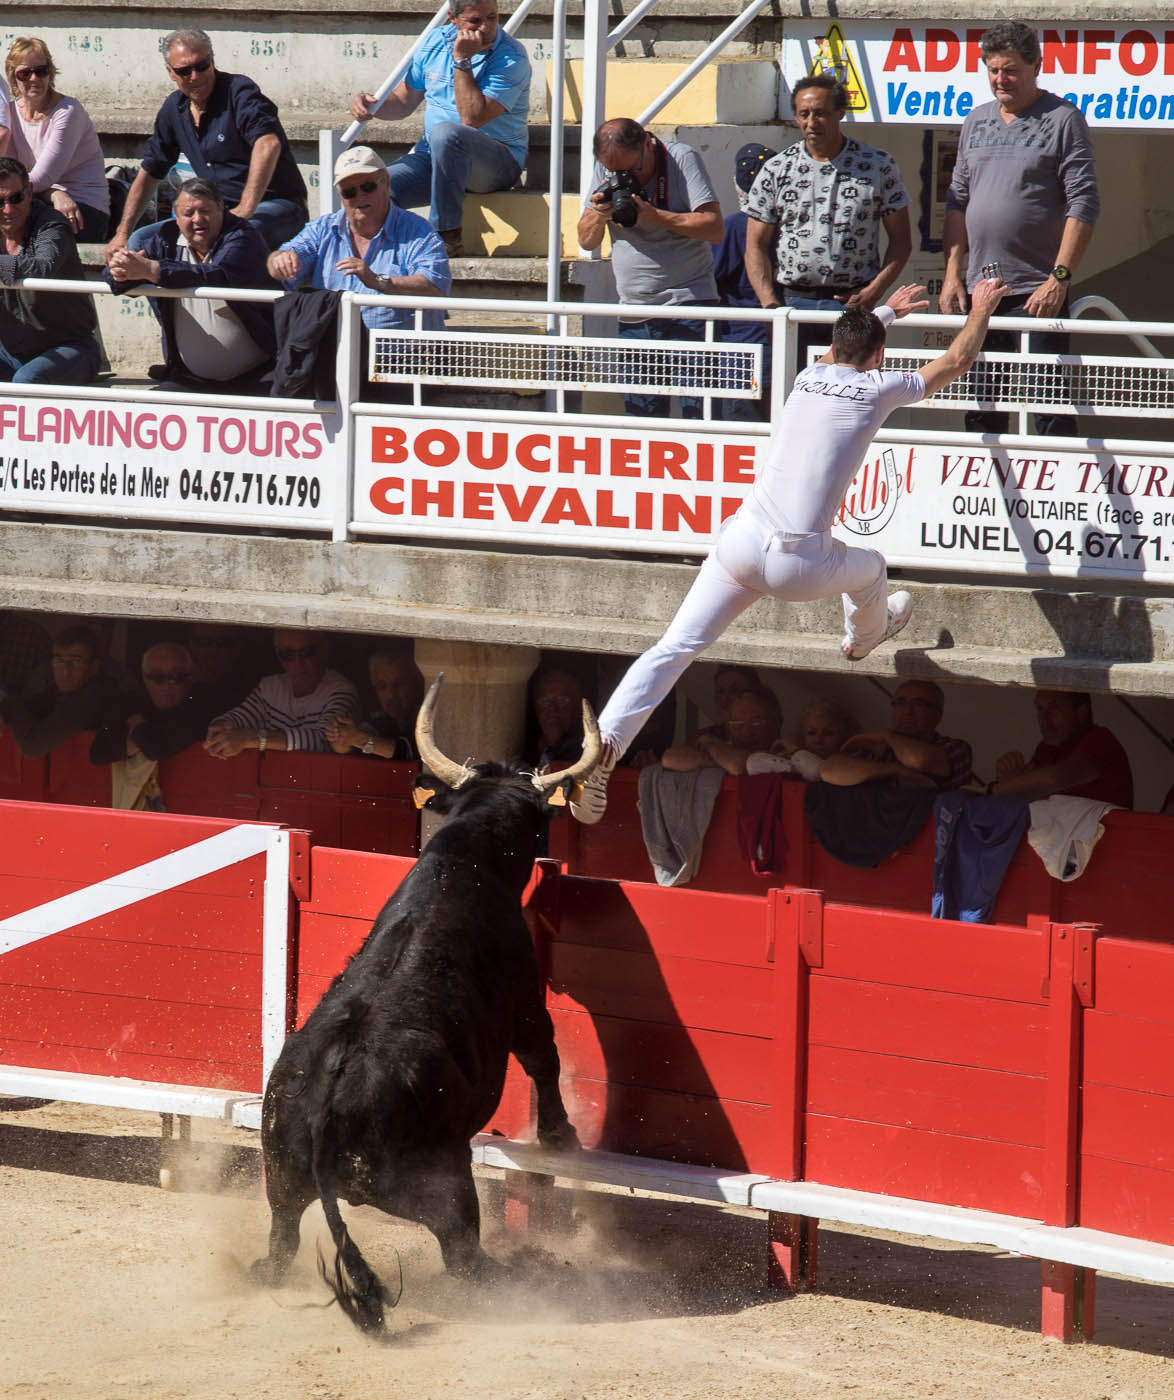 A raseteur narrowly escapes a bull